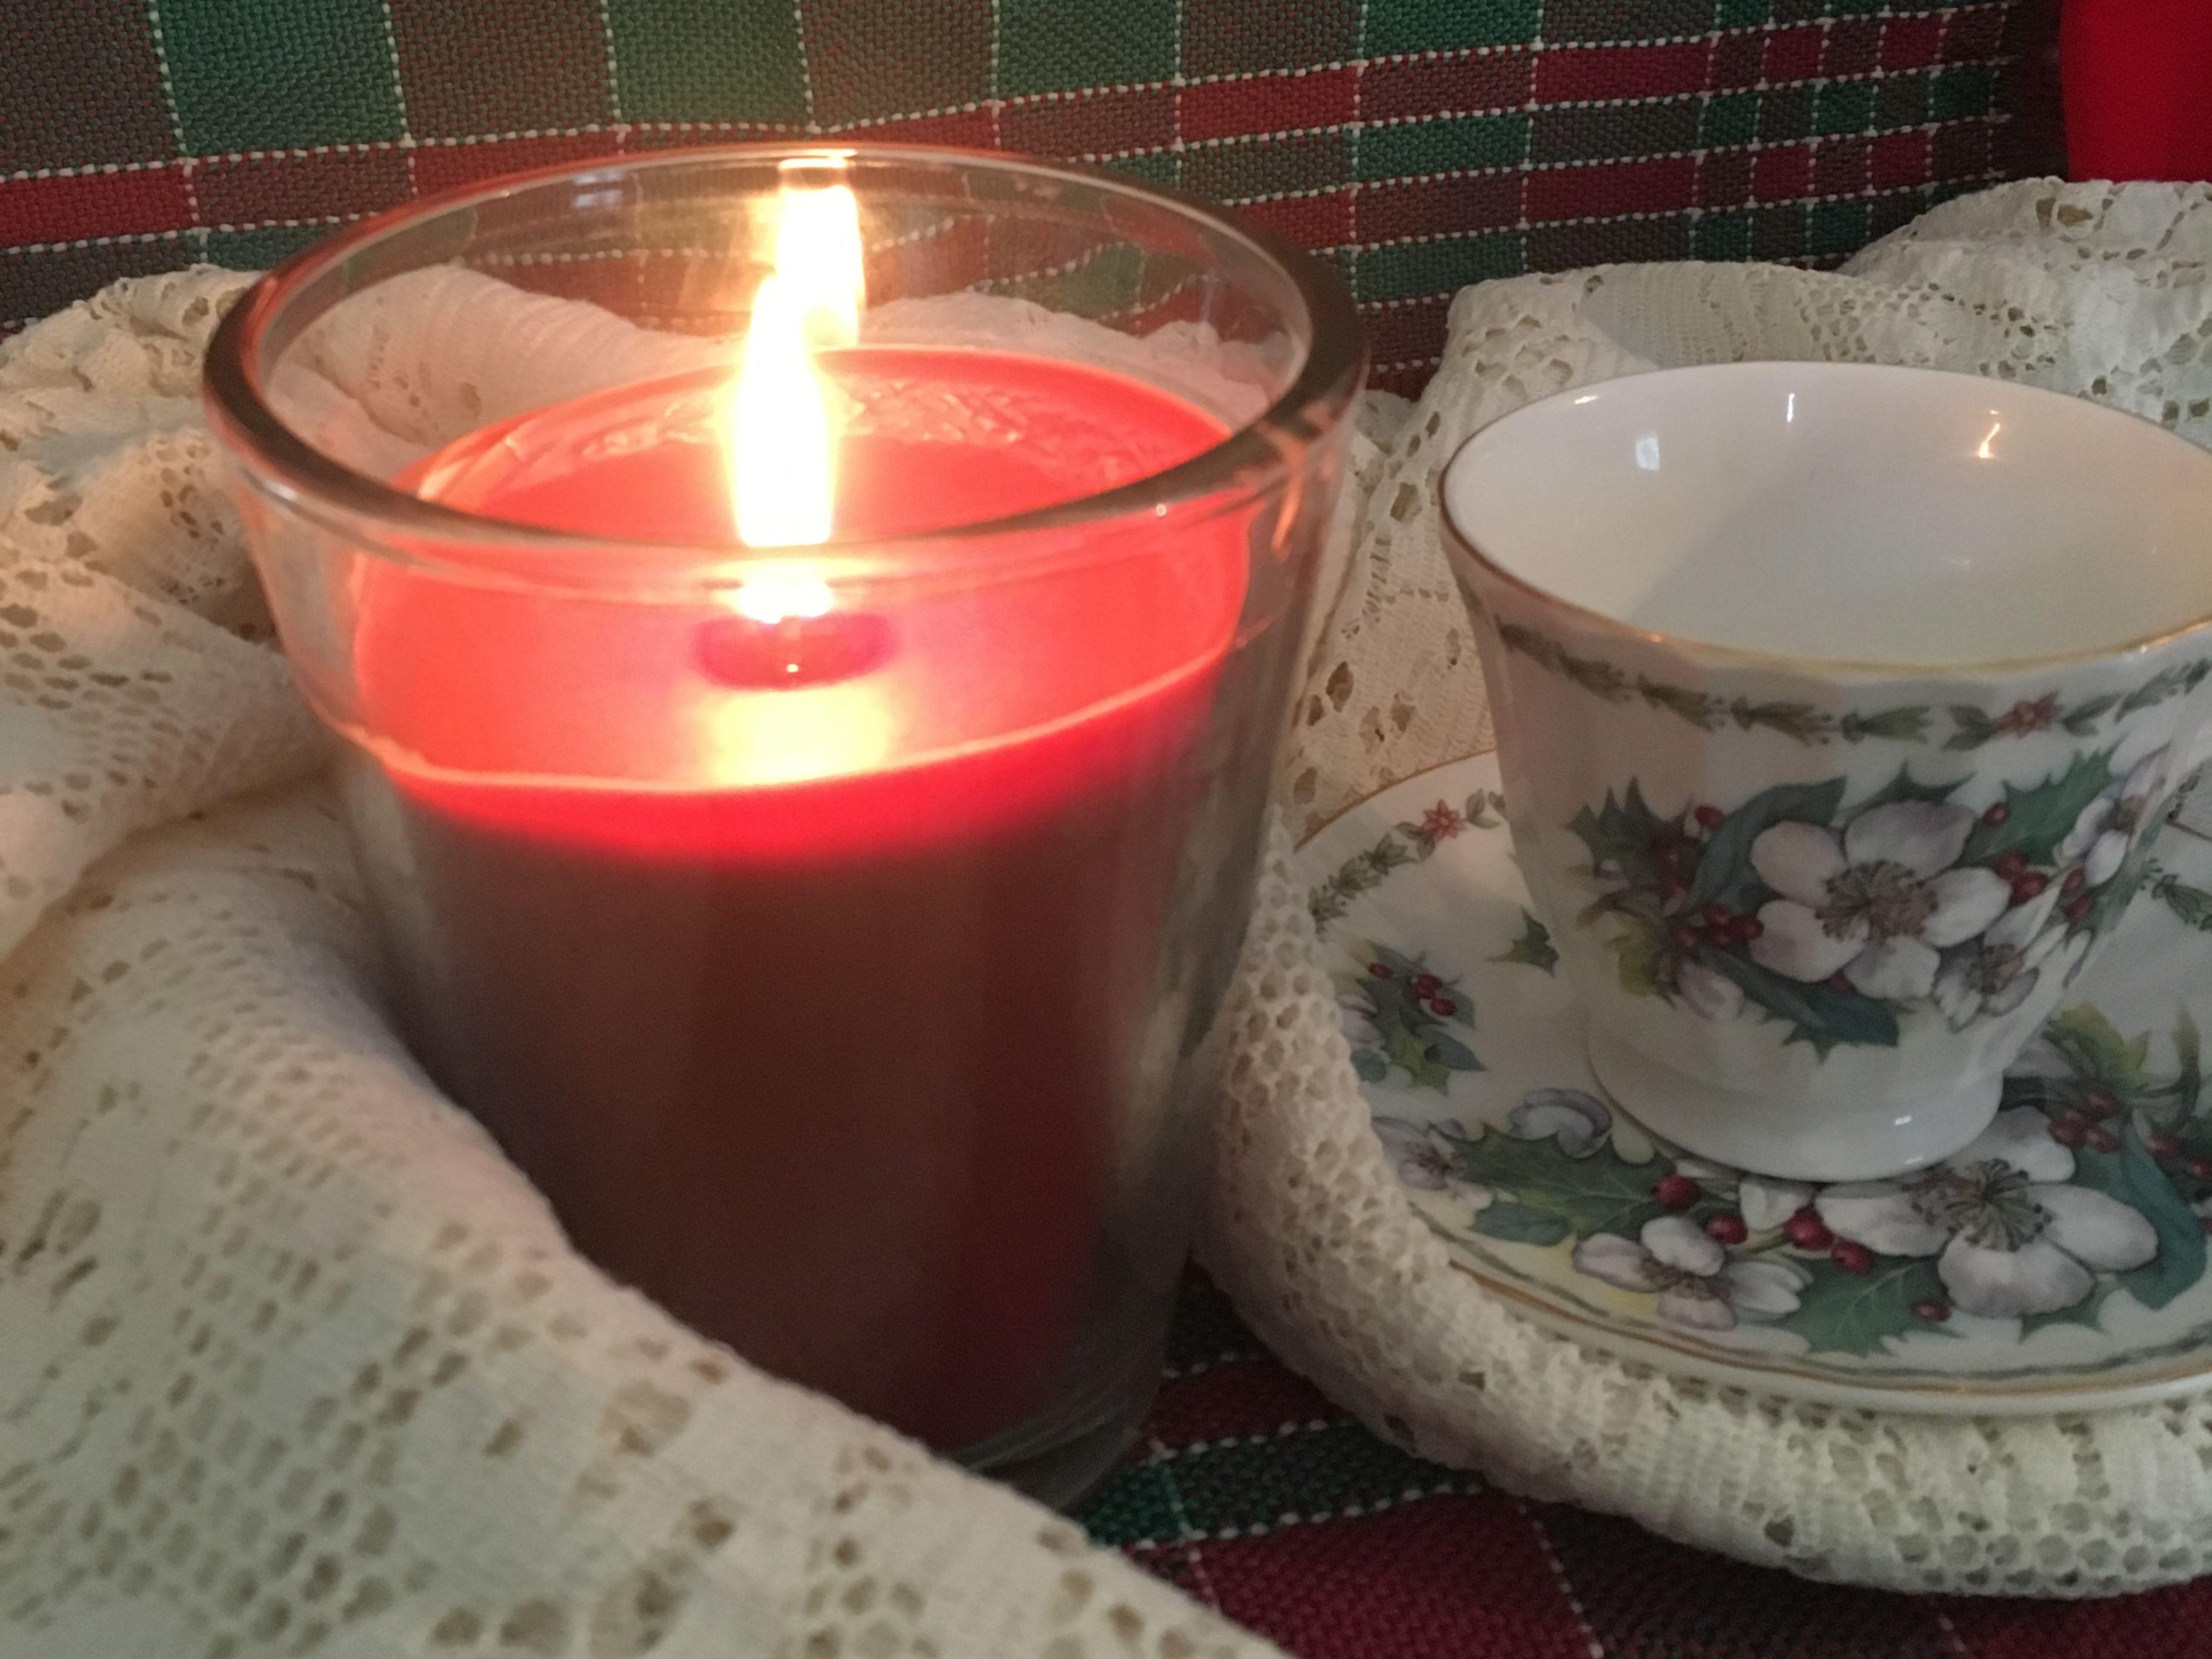 Mom's holiday teacup